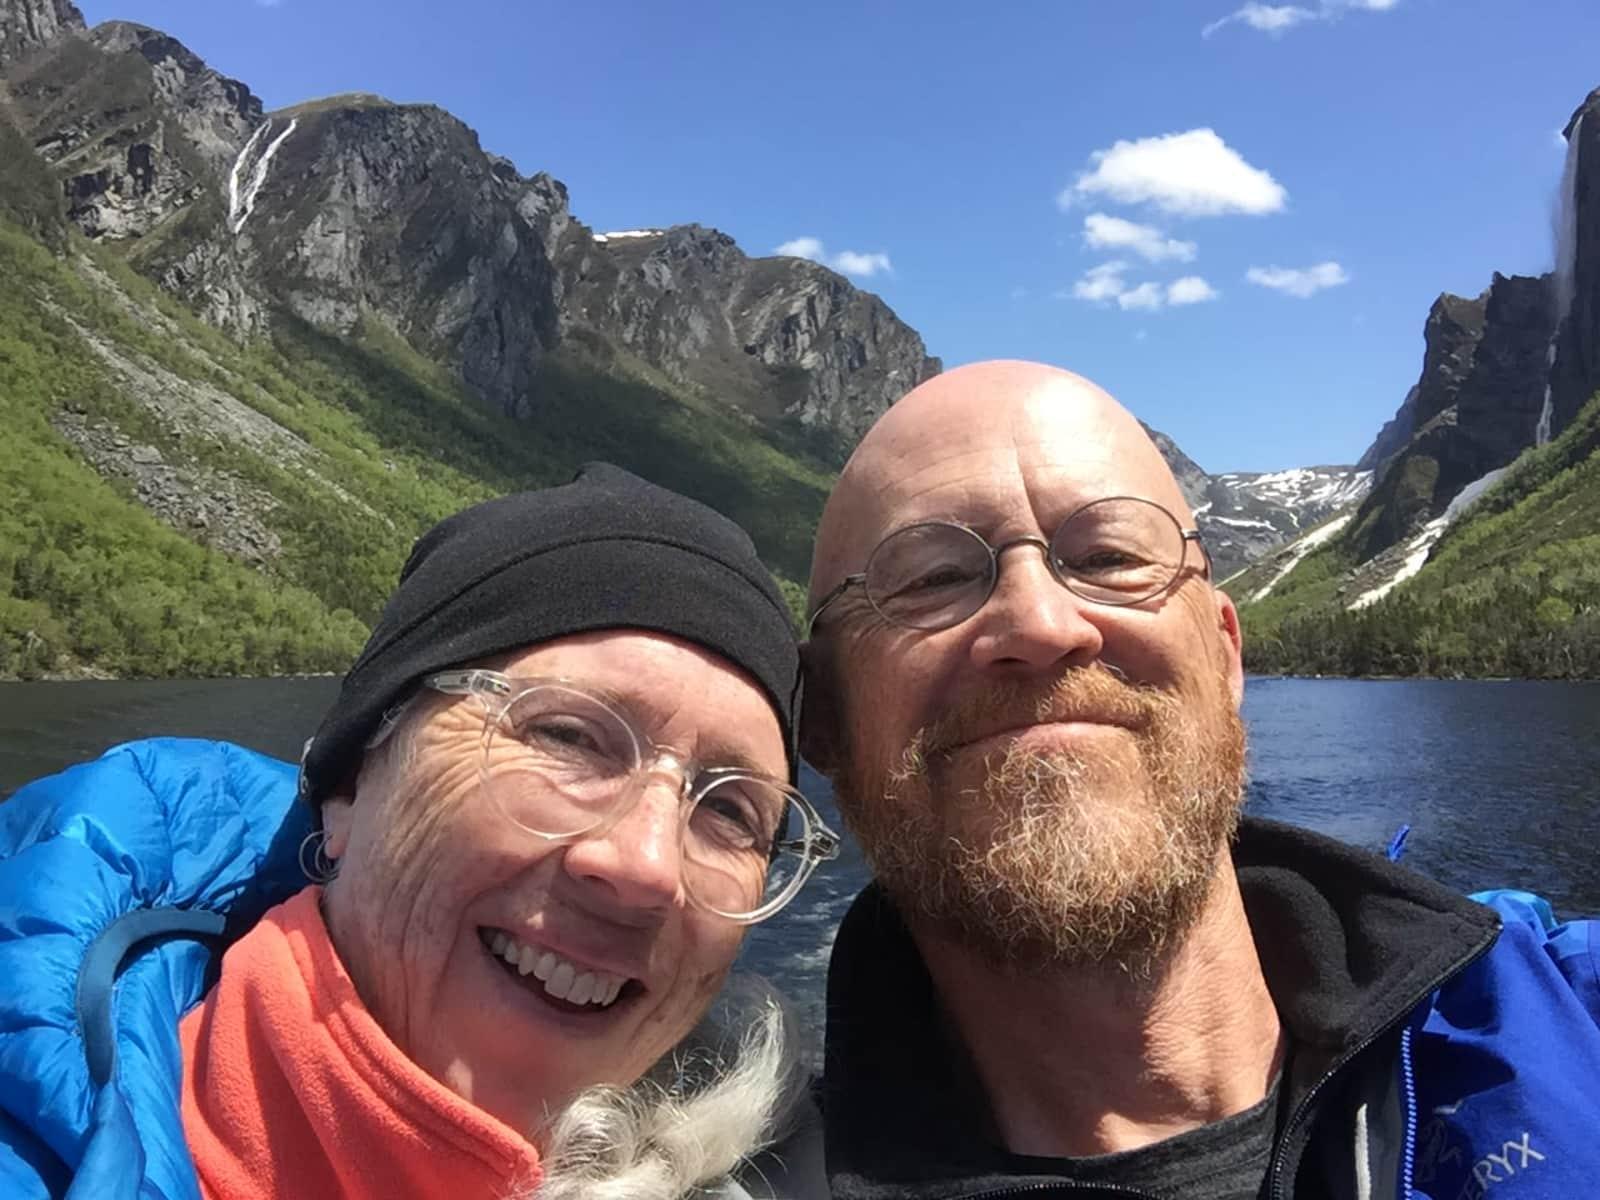 Chris & Ann from Calgary, Alberta, Canada